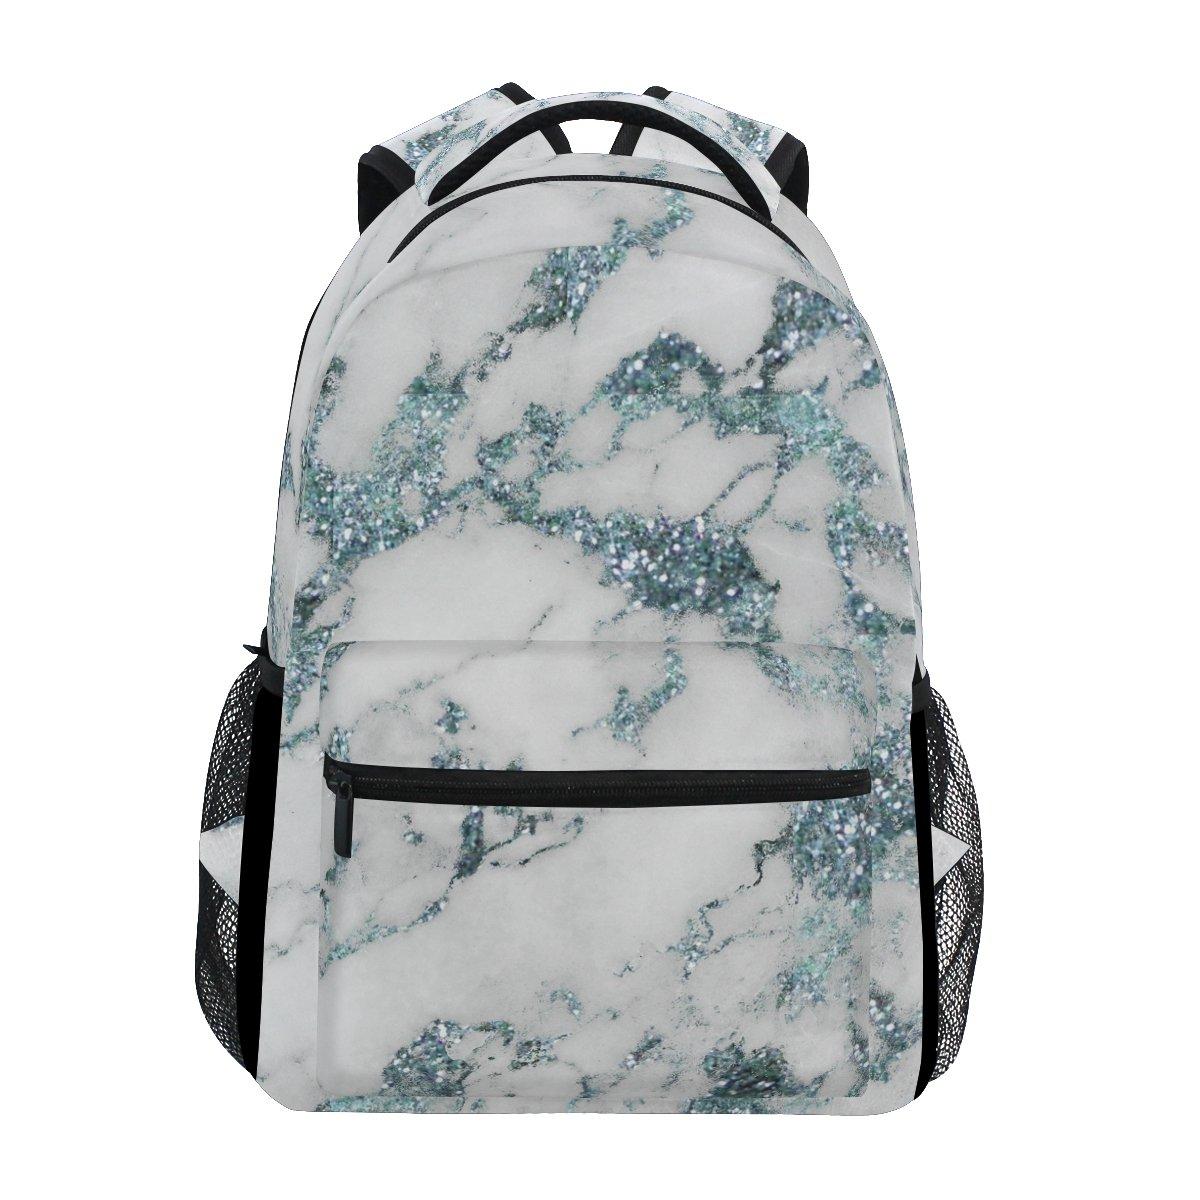 72feb2e65b6 Amazon.com: AHOMY School Backpack Marble Pattern College Book Bag Travel  Rucksack: Toys & Games